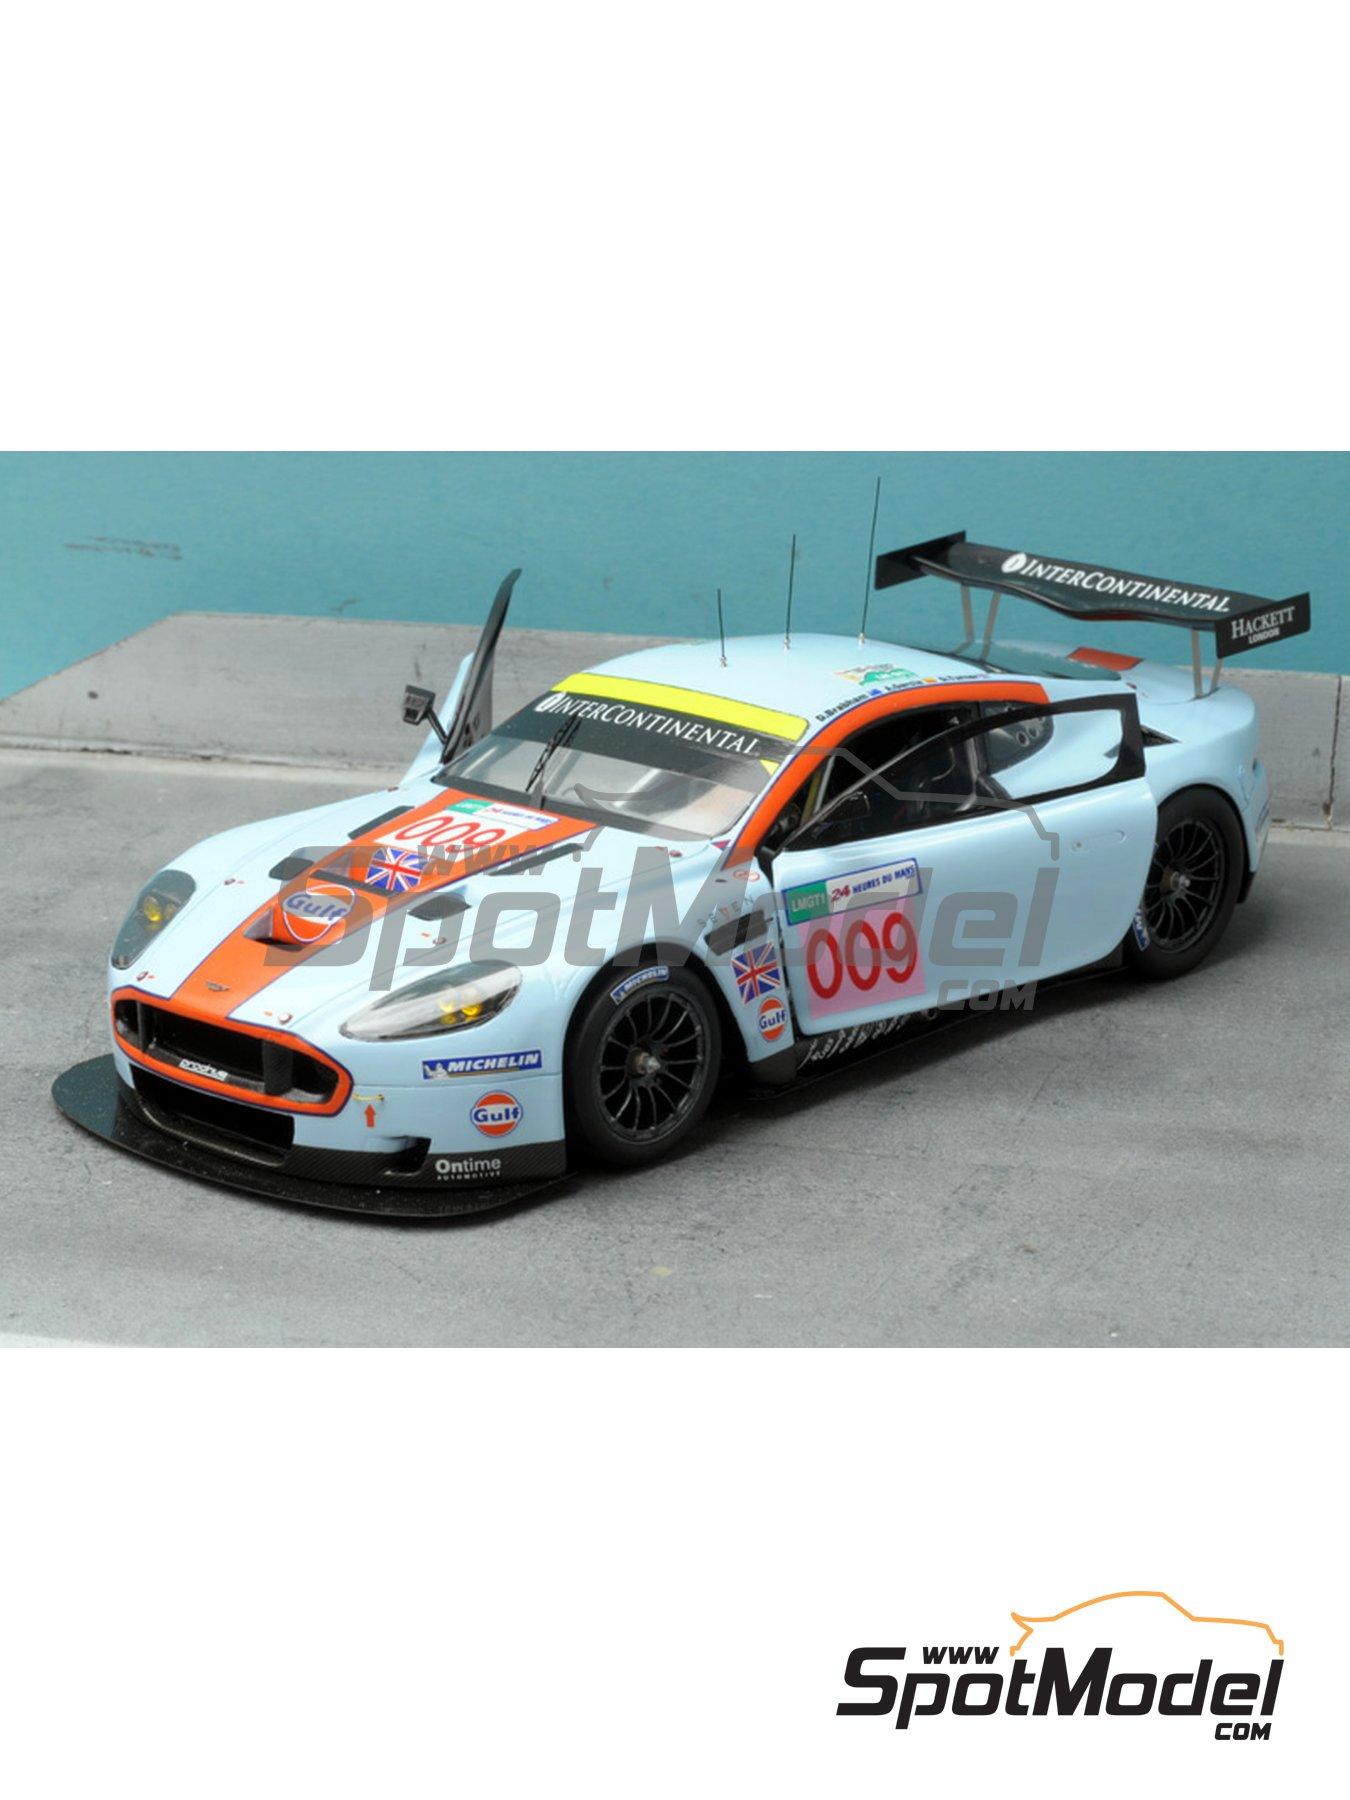 Aston Martin DBR9 Gulf   24 Hours Le Mans 2008 | Model Car Kit In 1